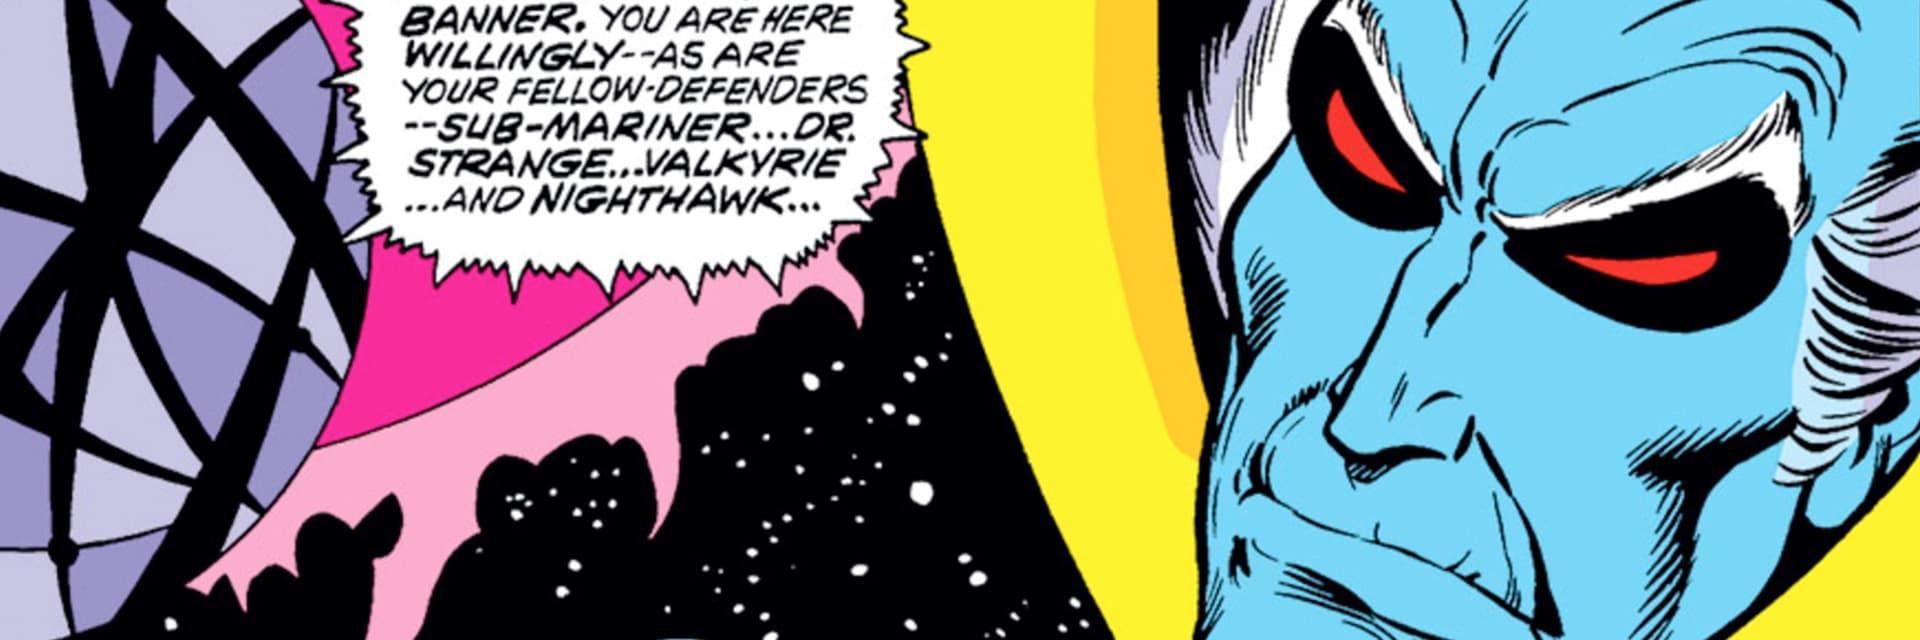 Grandmaster In Comics Powers, Enemies, History | Marvel